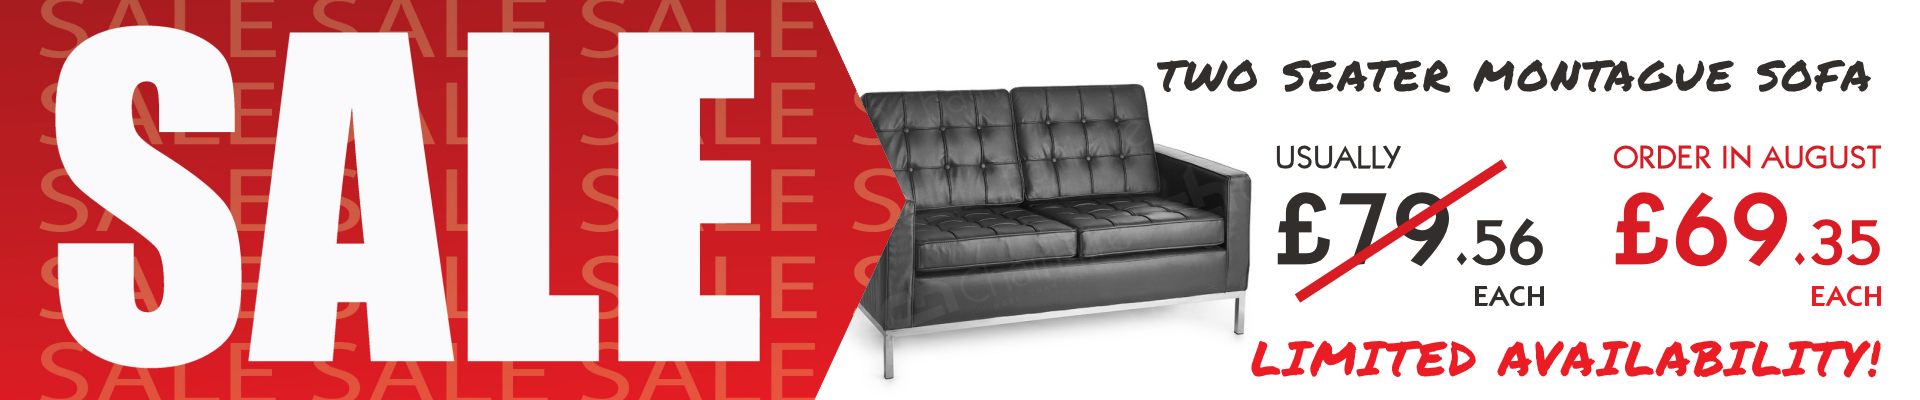 Two Seater Black Montague Sofa Sale